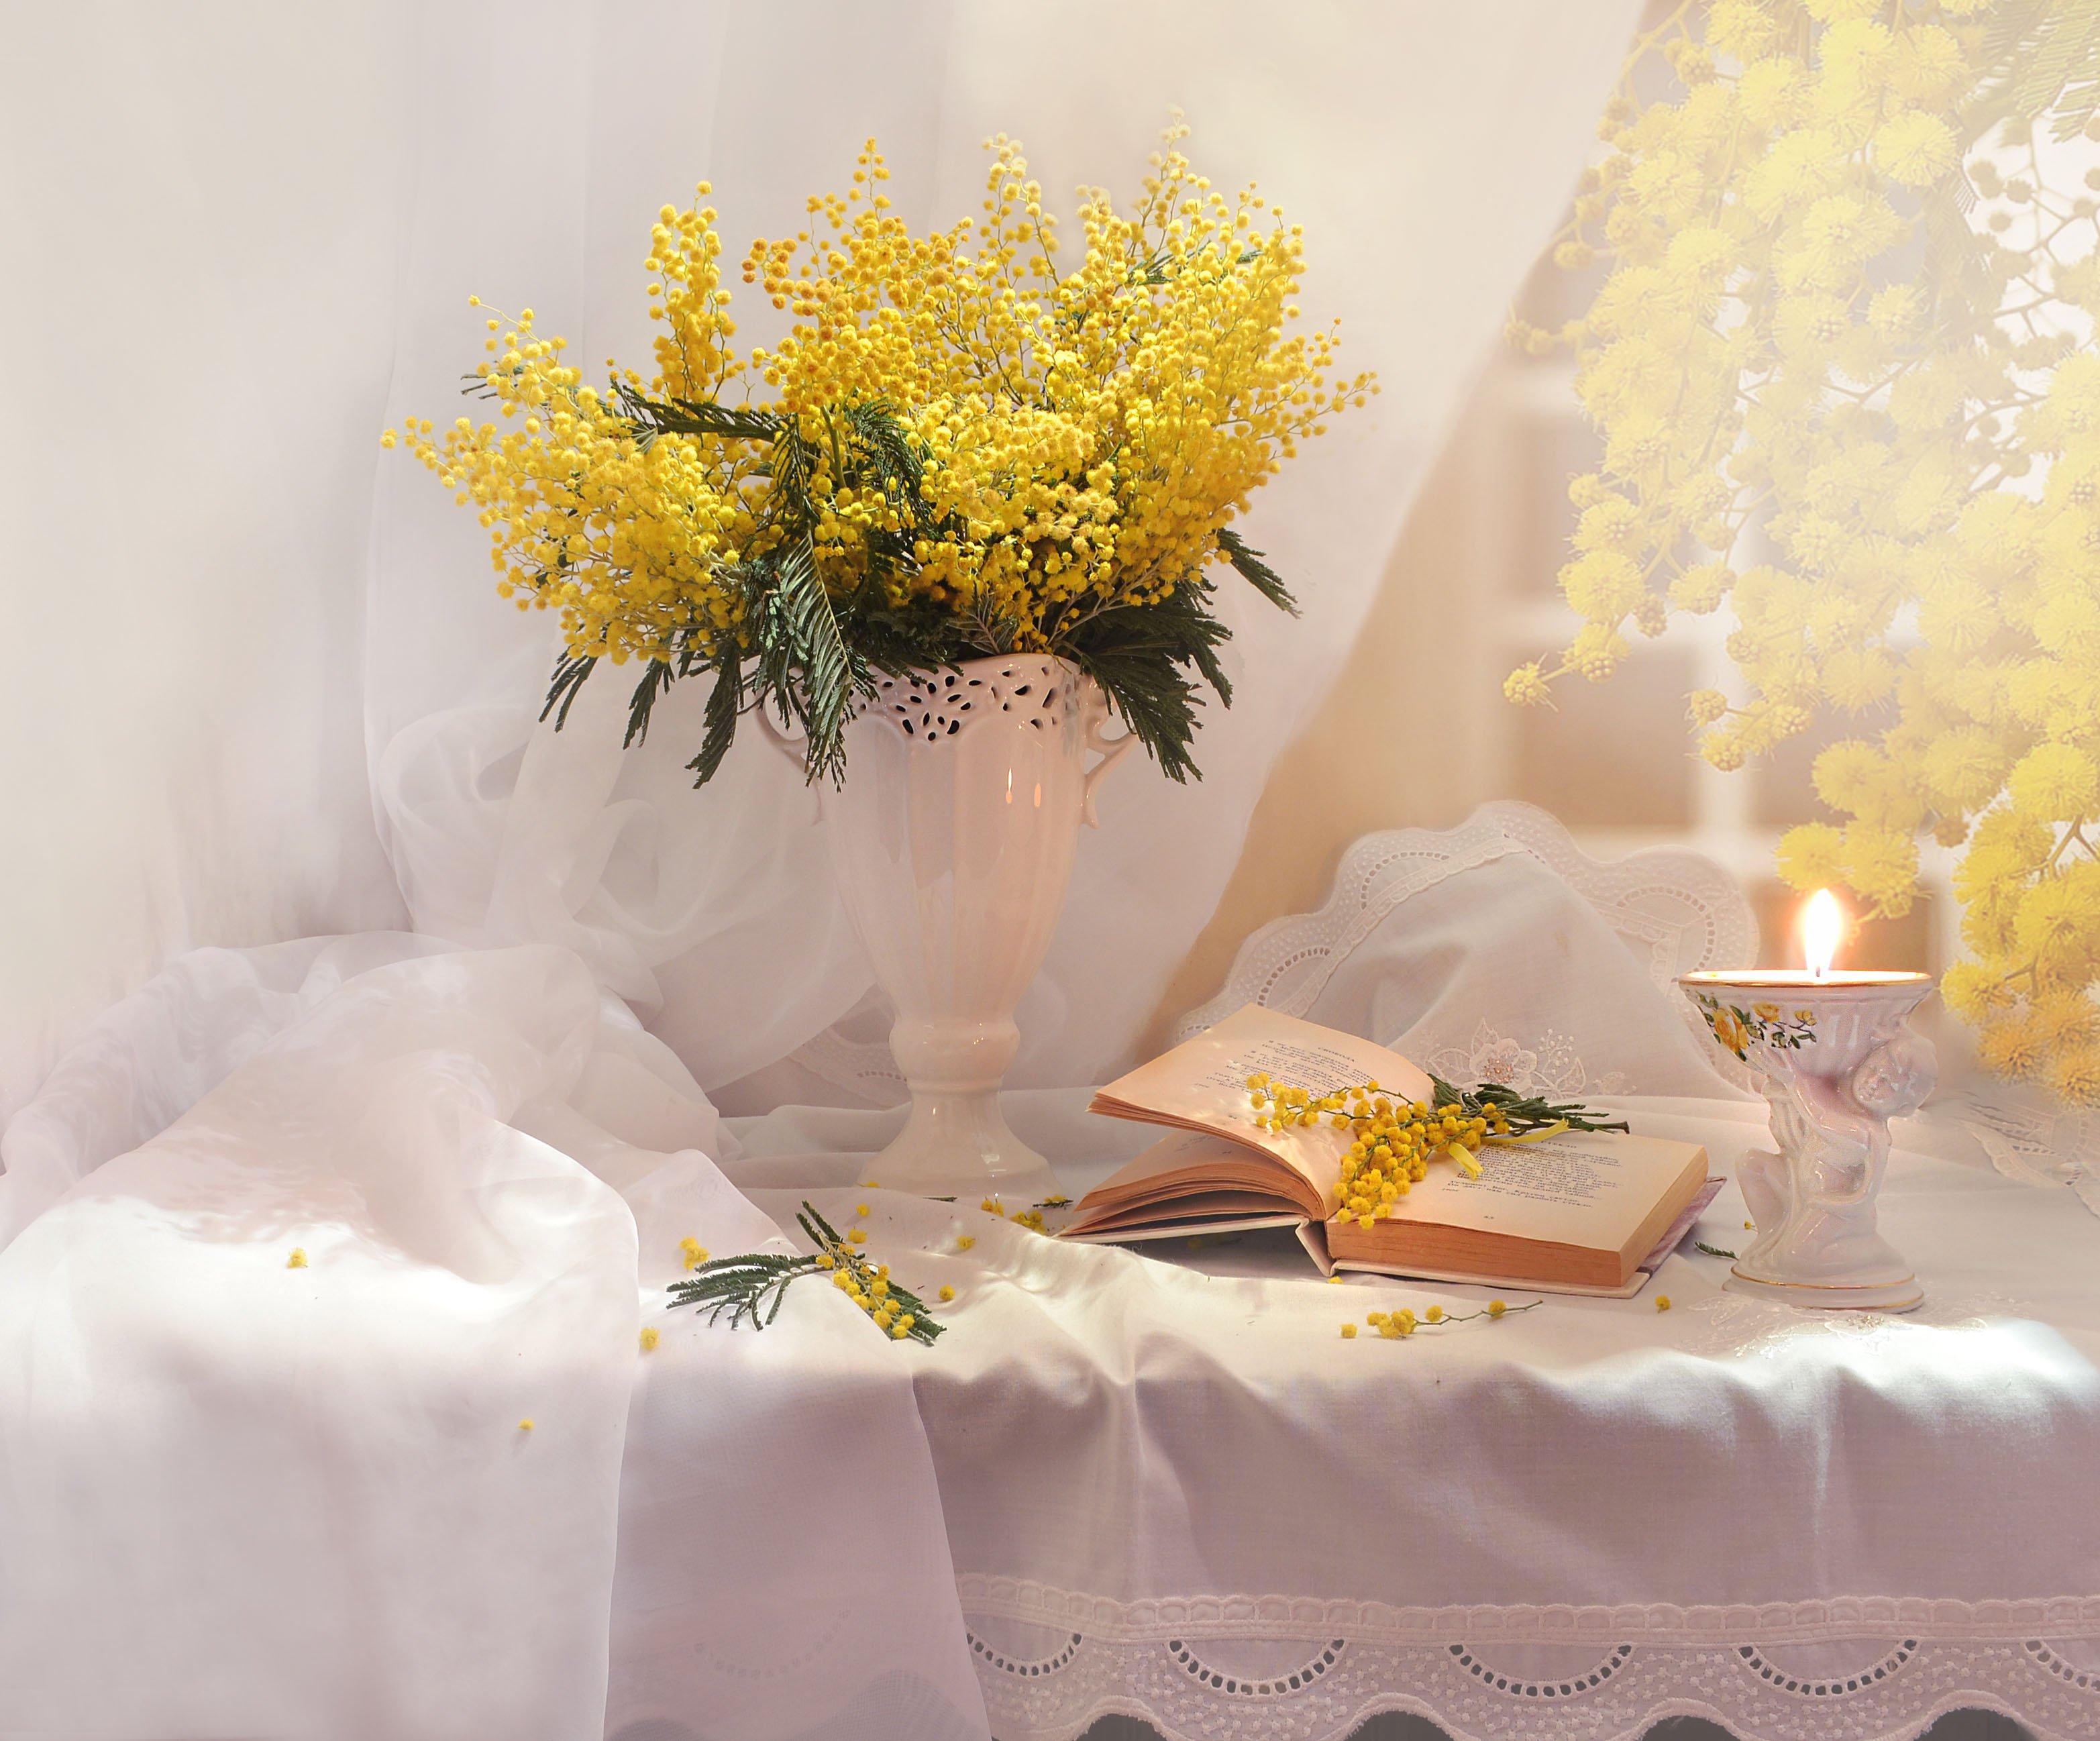 still life, натюрморт, мимоза, цветы, весна, март, книга, стихи, подсвечник, свеча, Колова Валентина